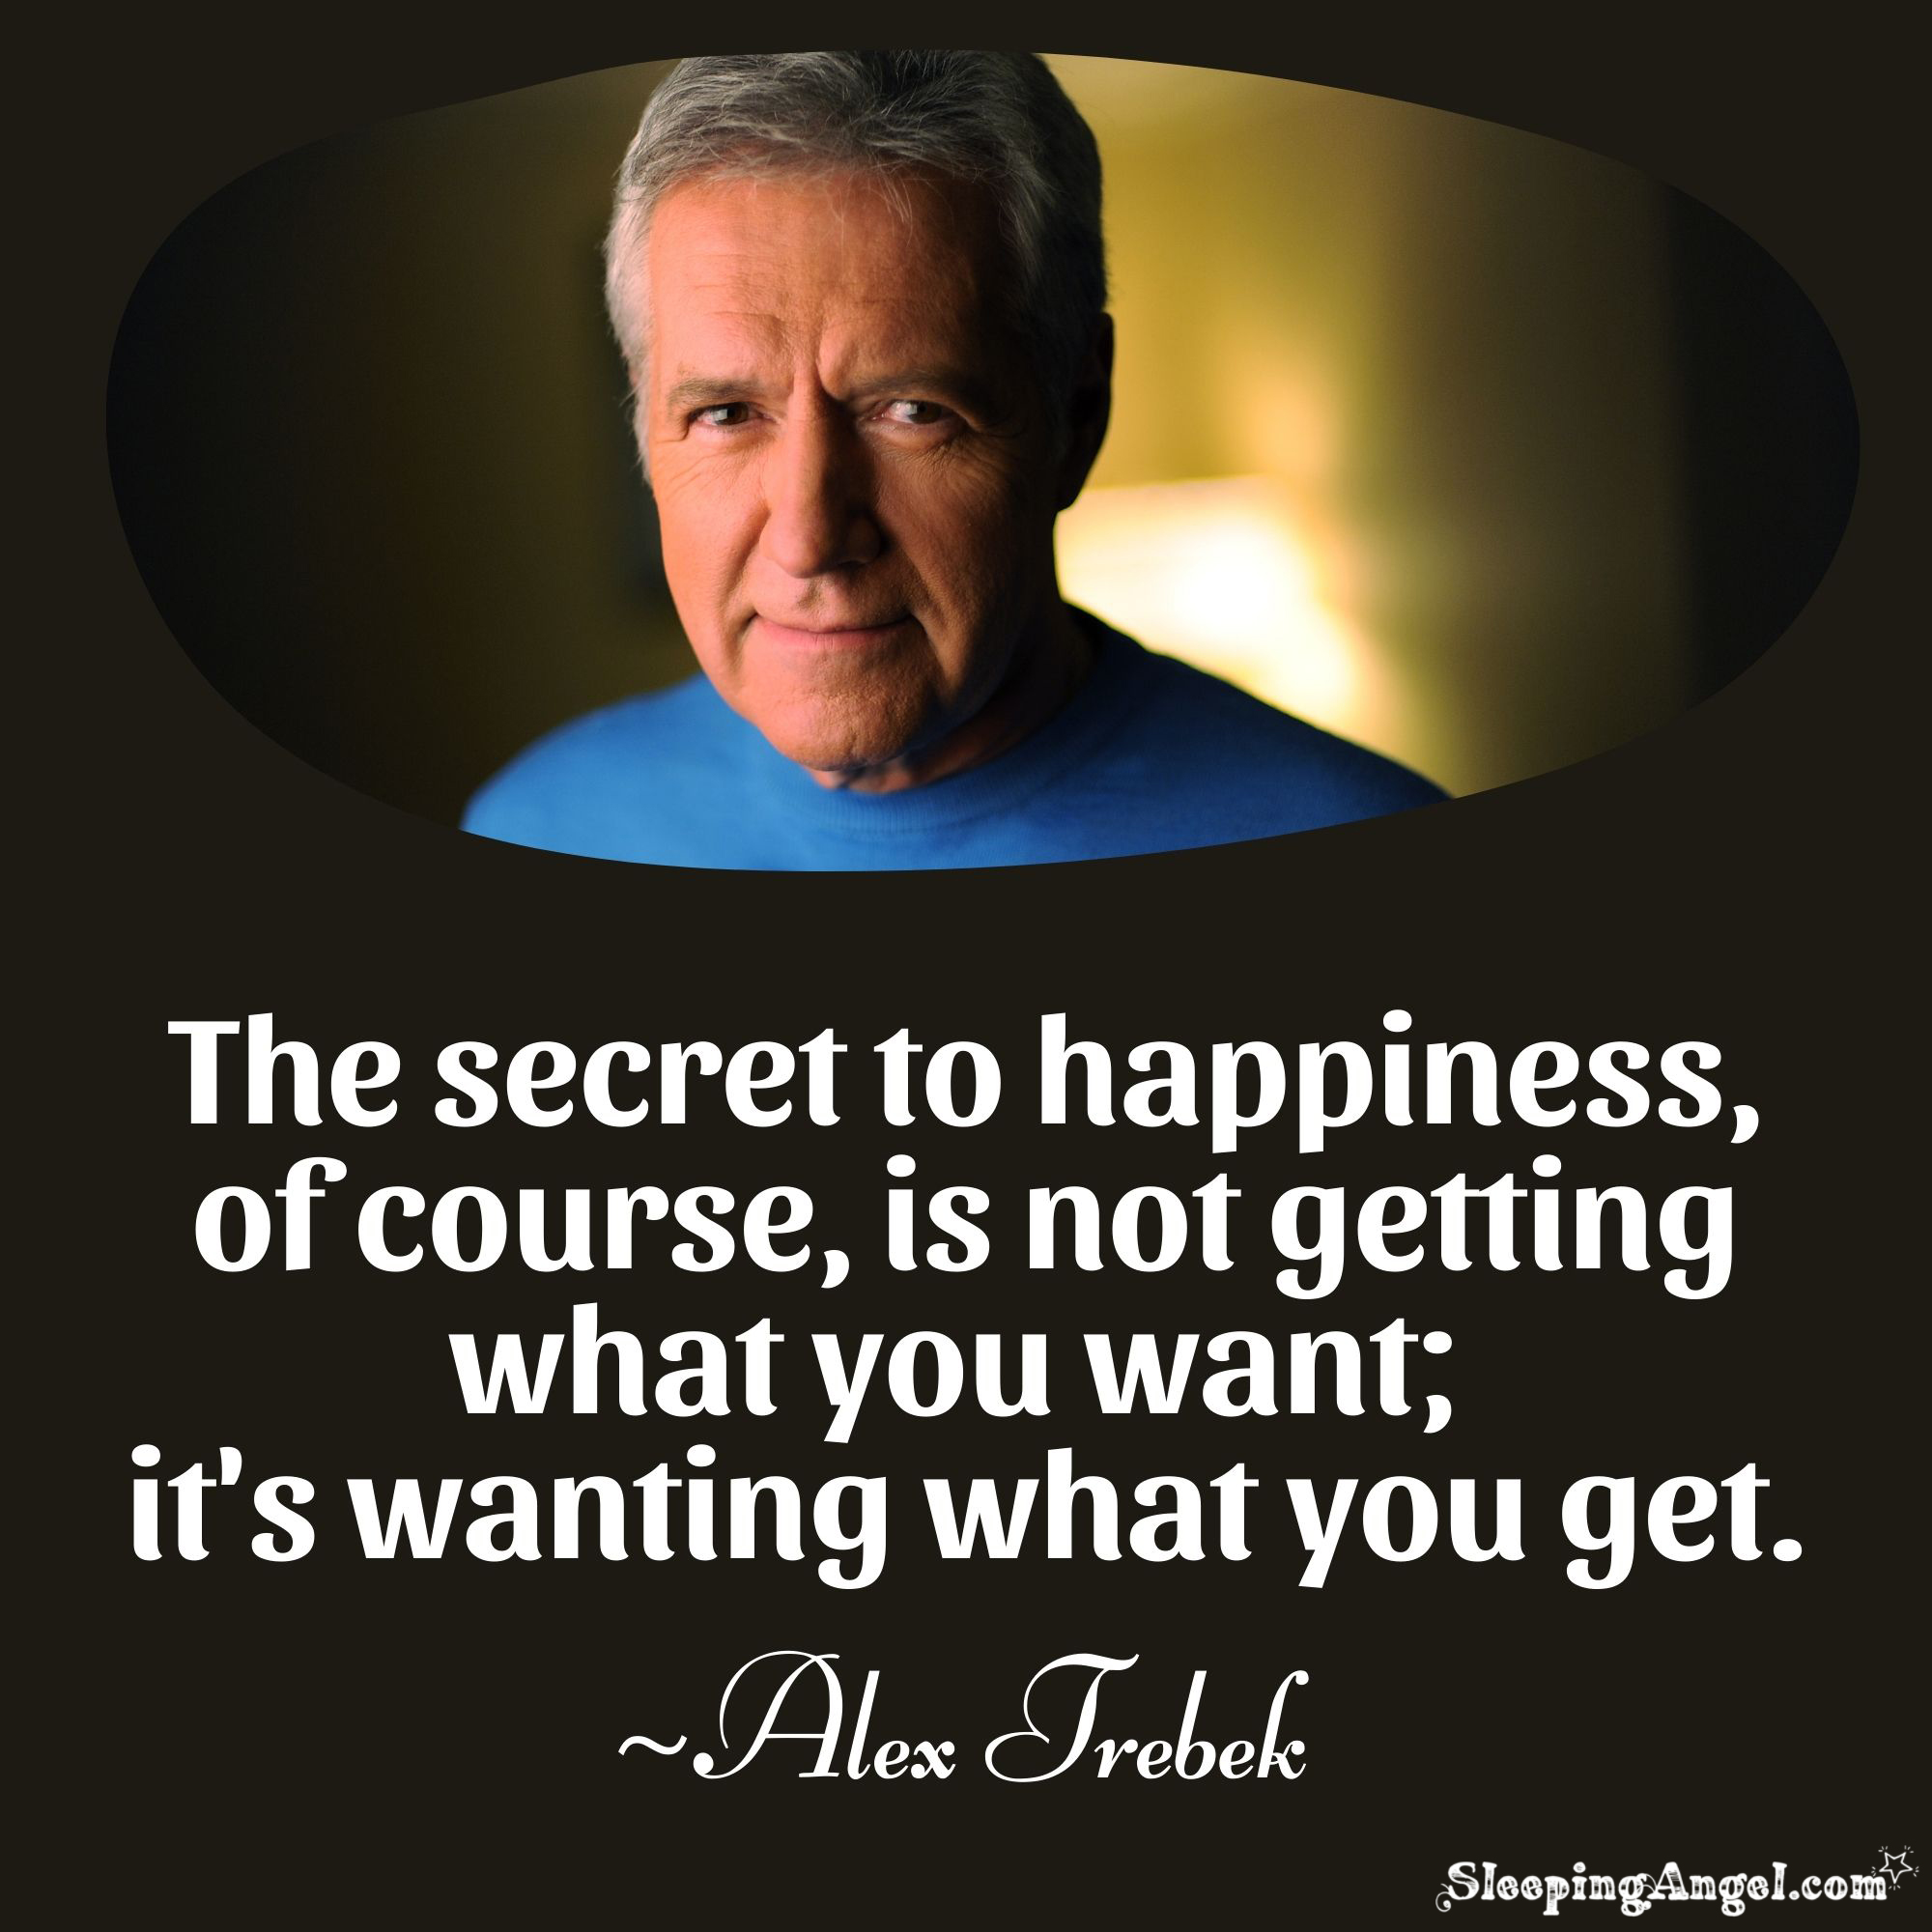 Alex Trebek Quote